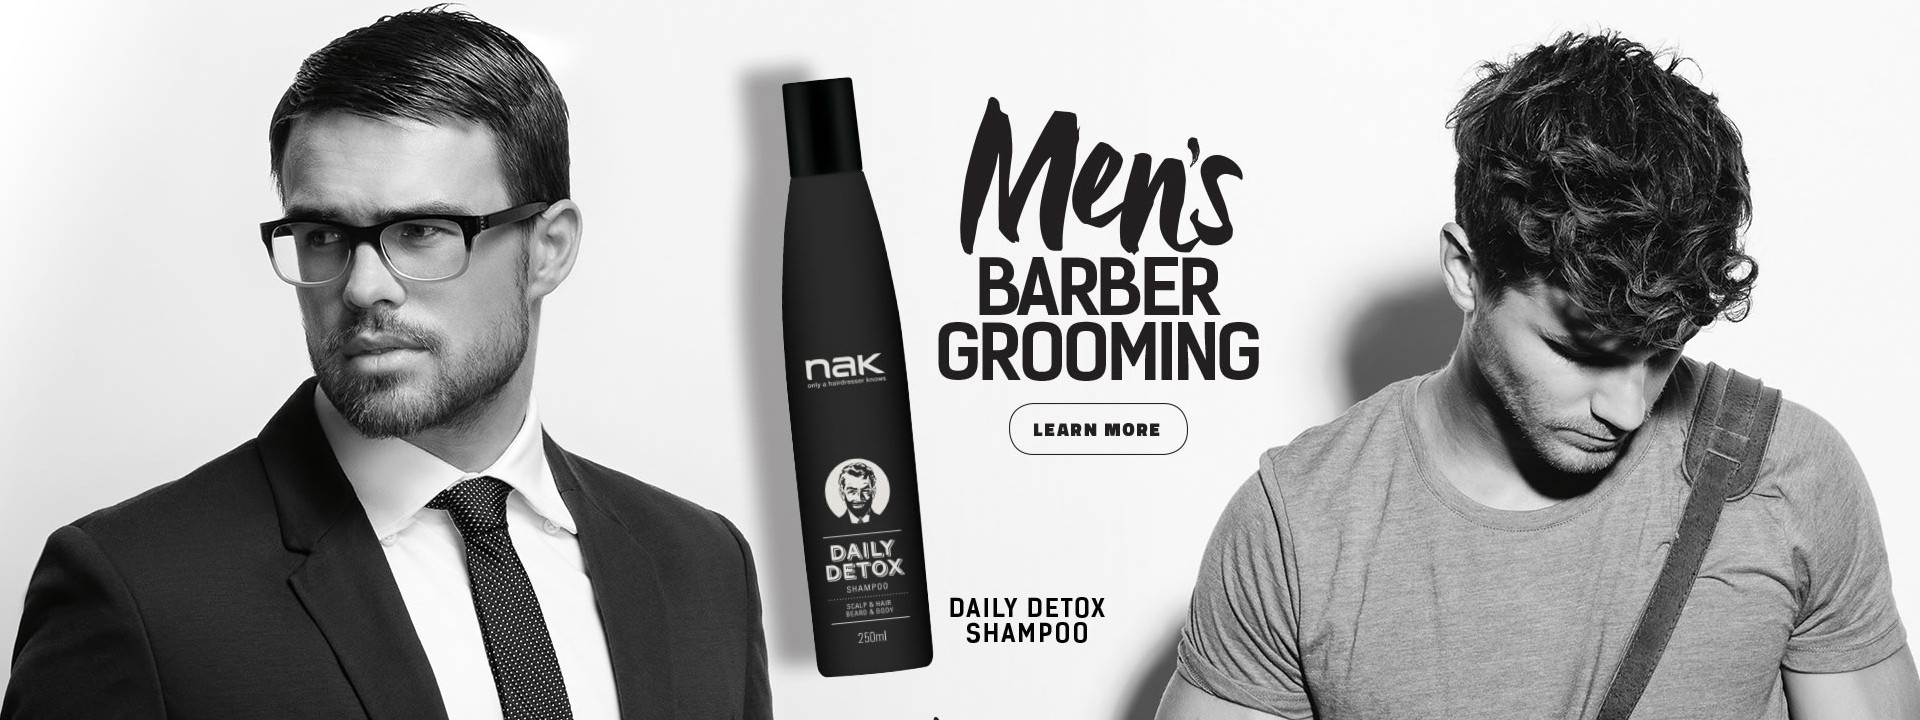 Nak Men's Grooming